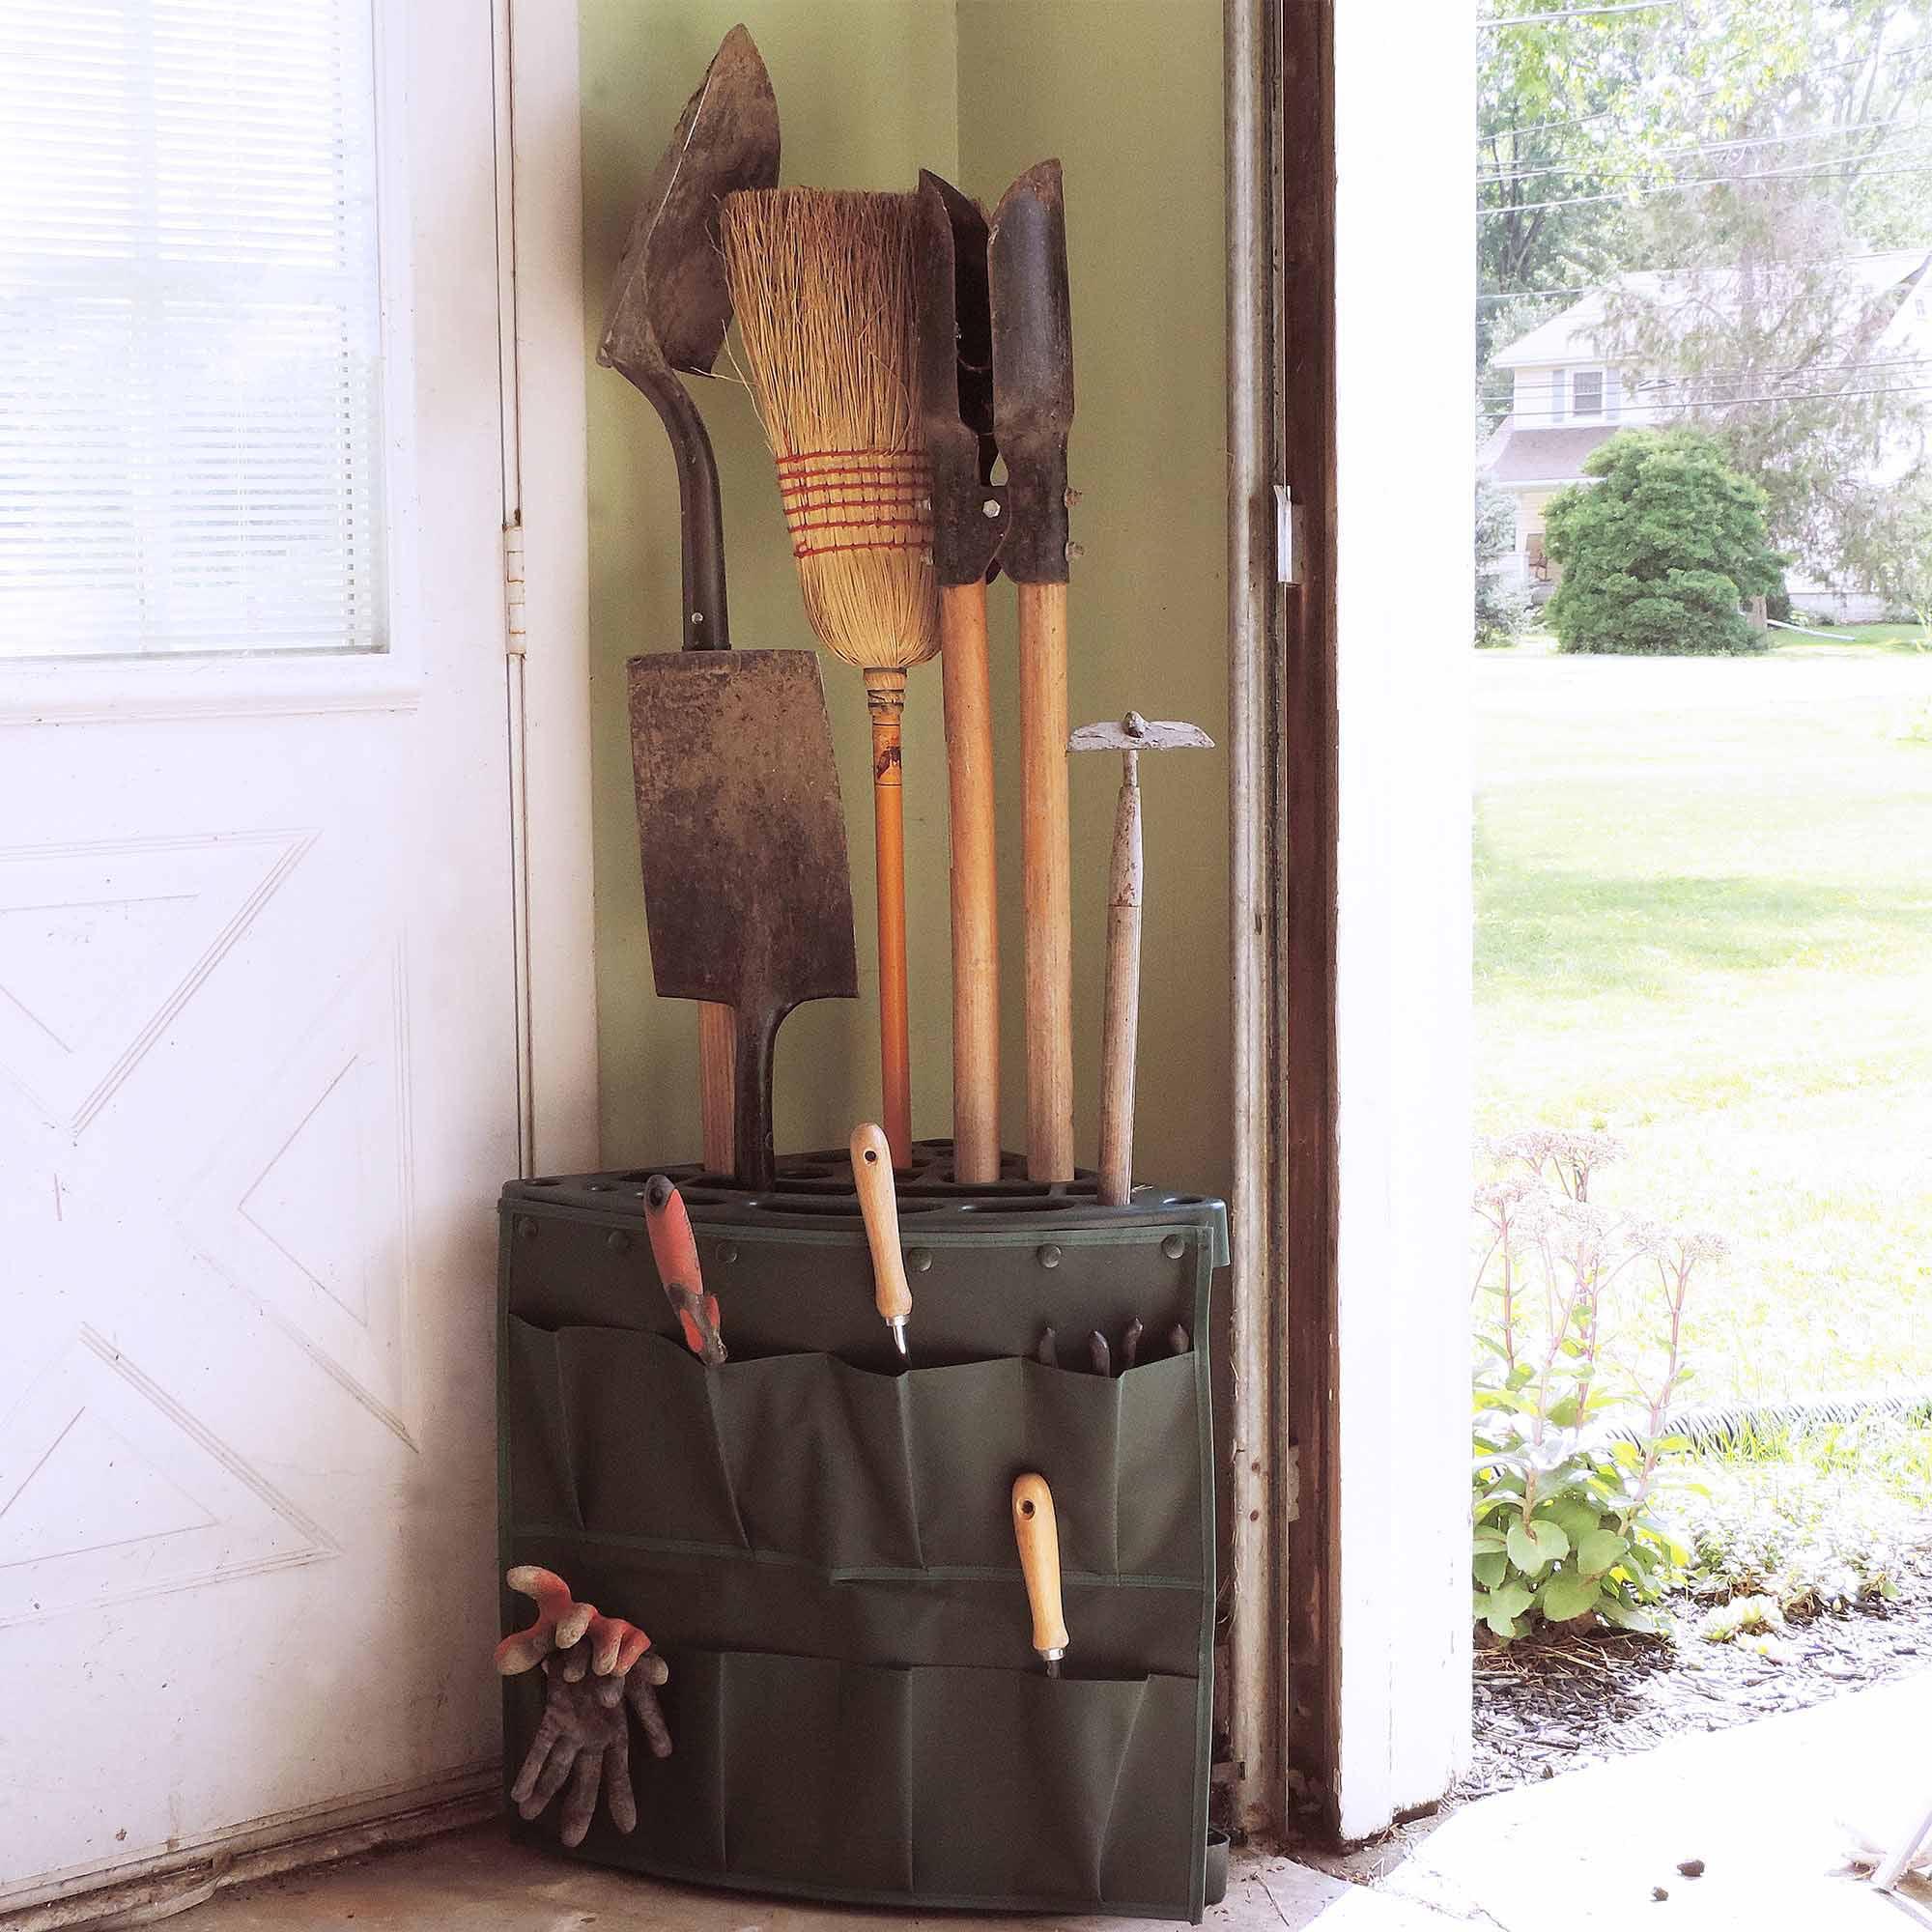 Stalwart Corner Storage Tool Rack Tower with Removable Storage Bag by Trademark Global LLC